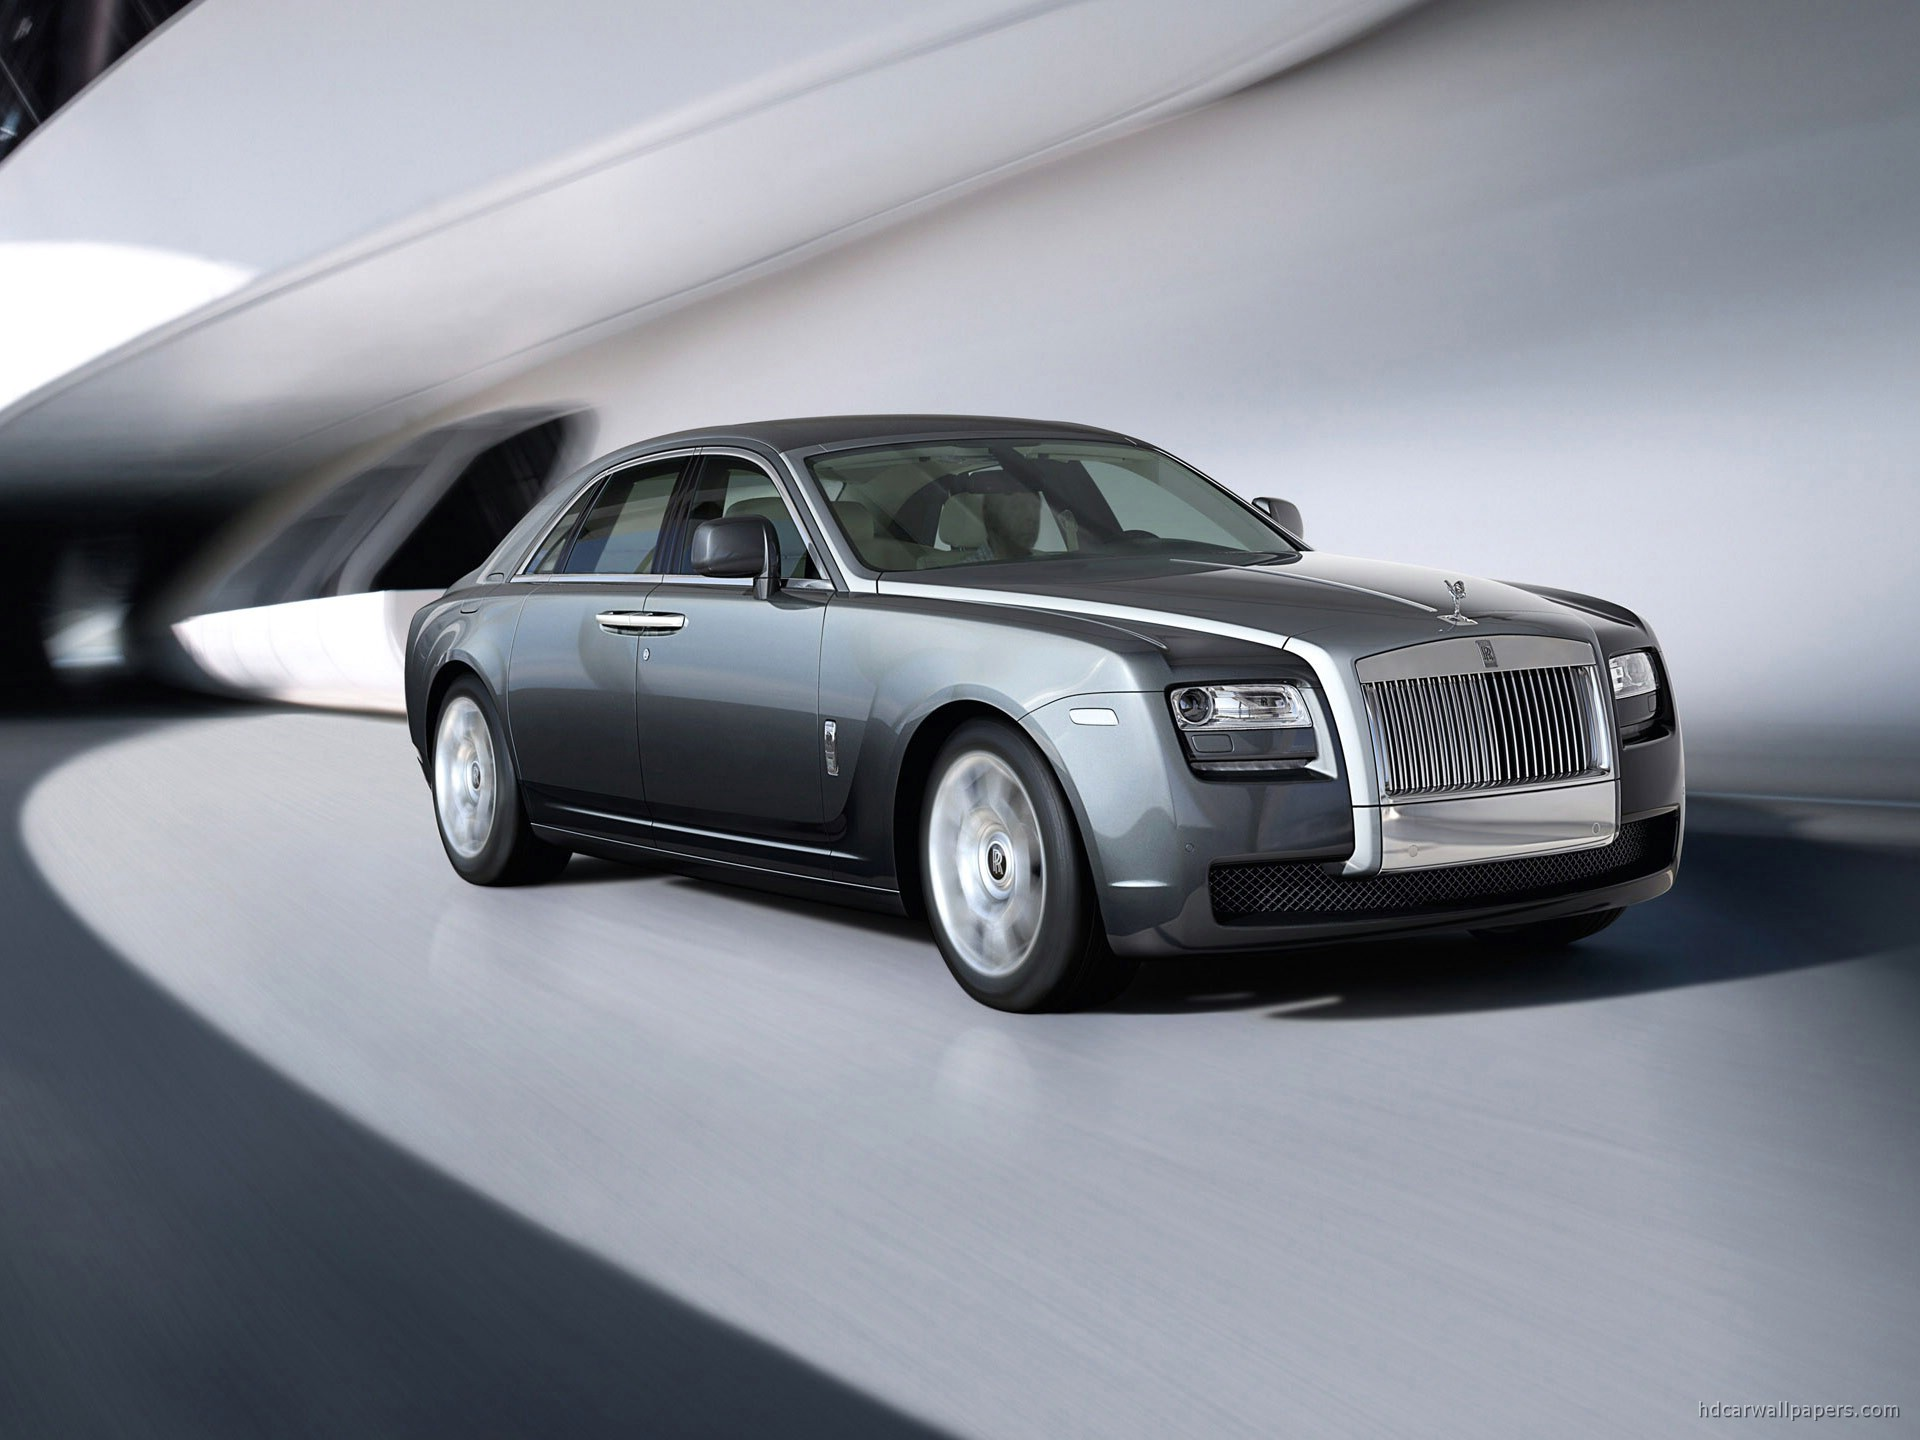 Rolls Royce Ghost Car Wallpaper | HD Car Wallpapers | ID #1183